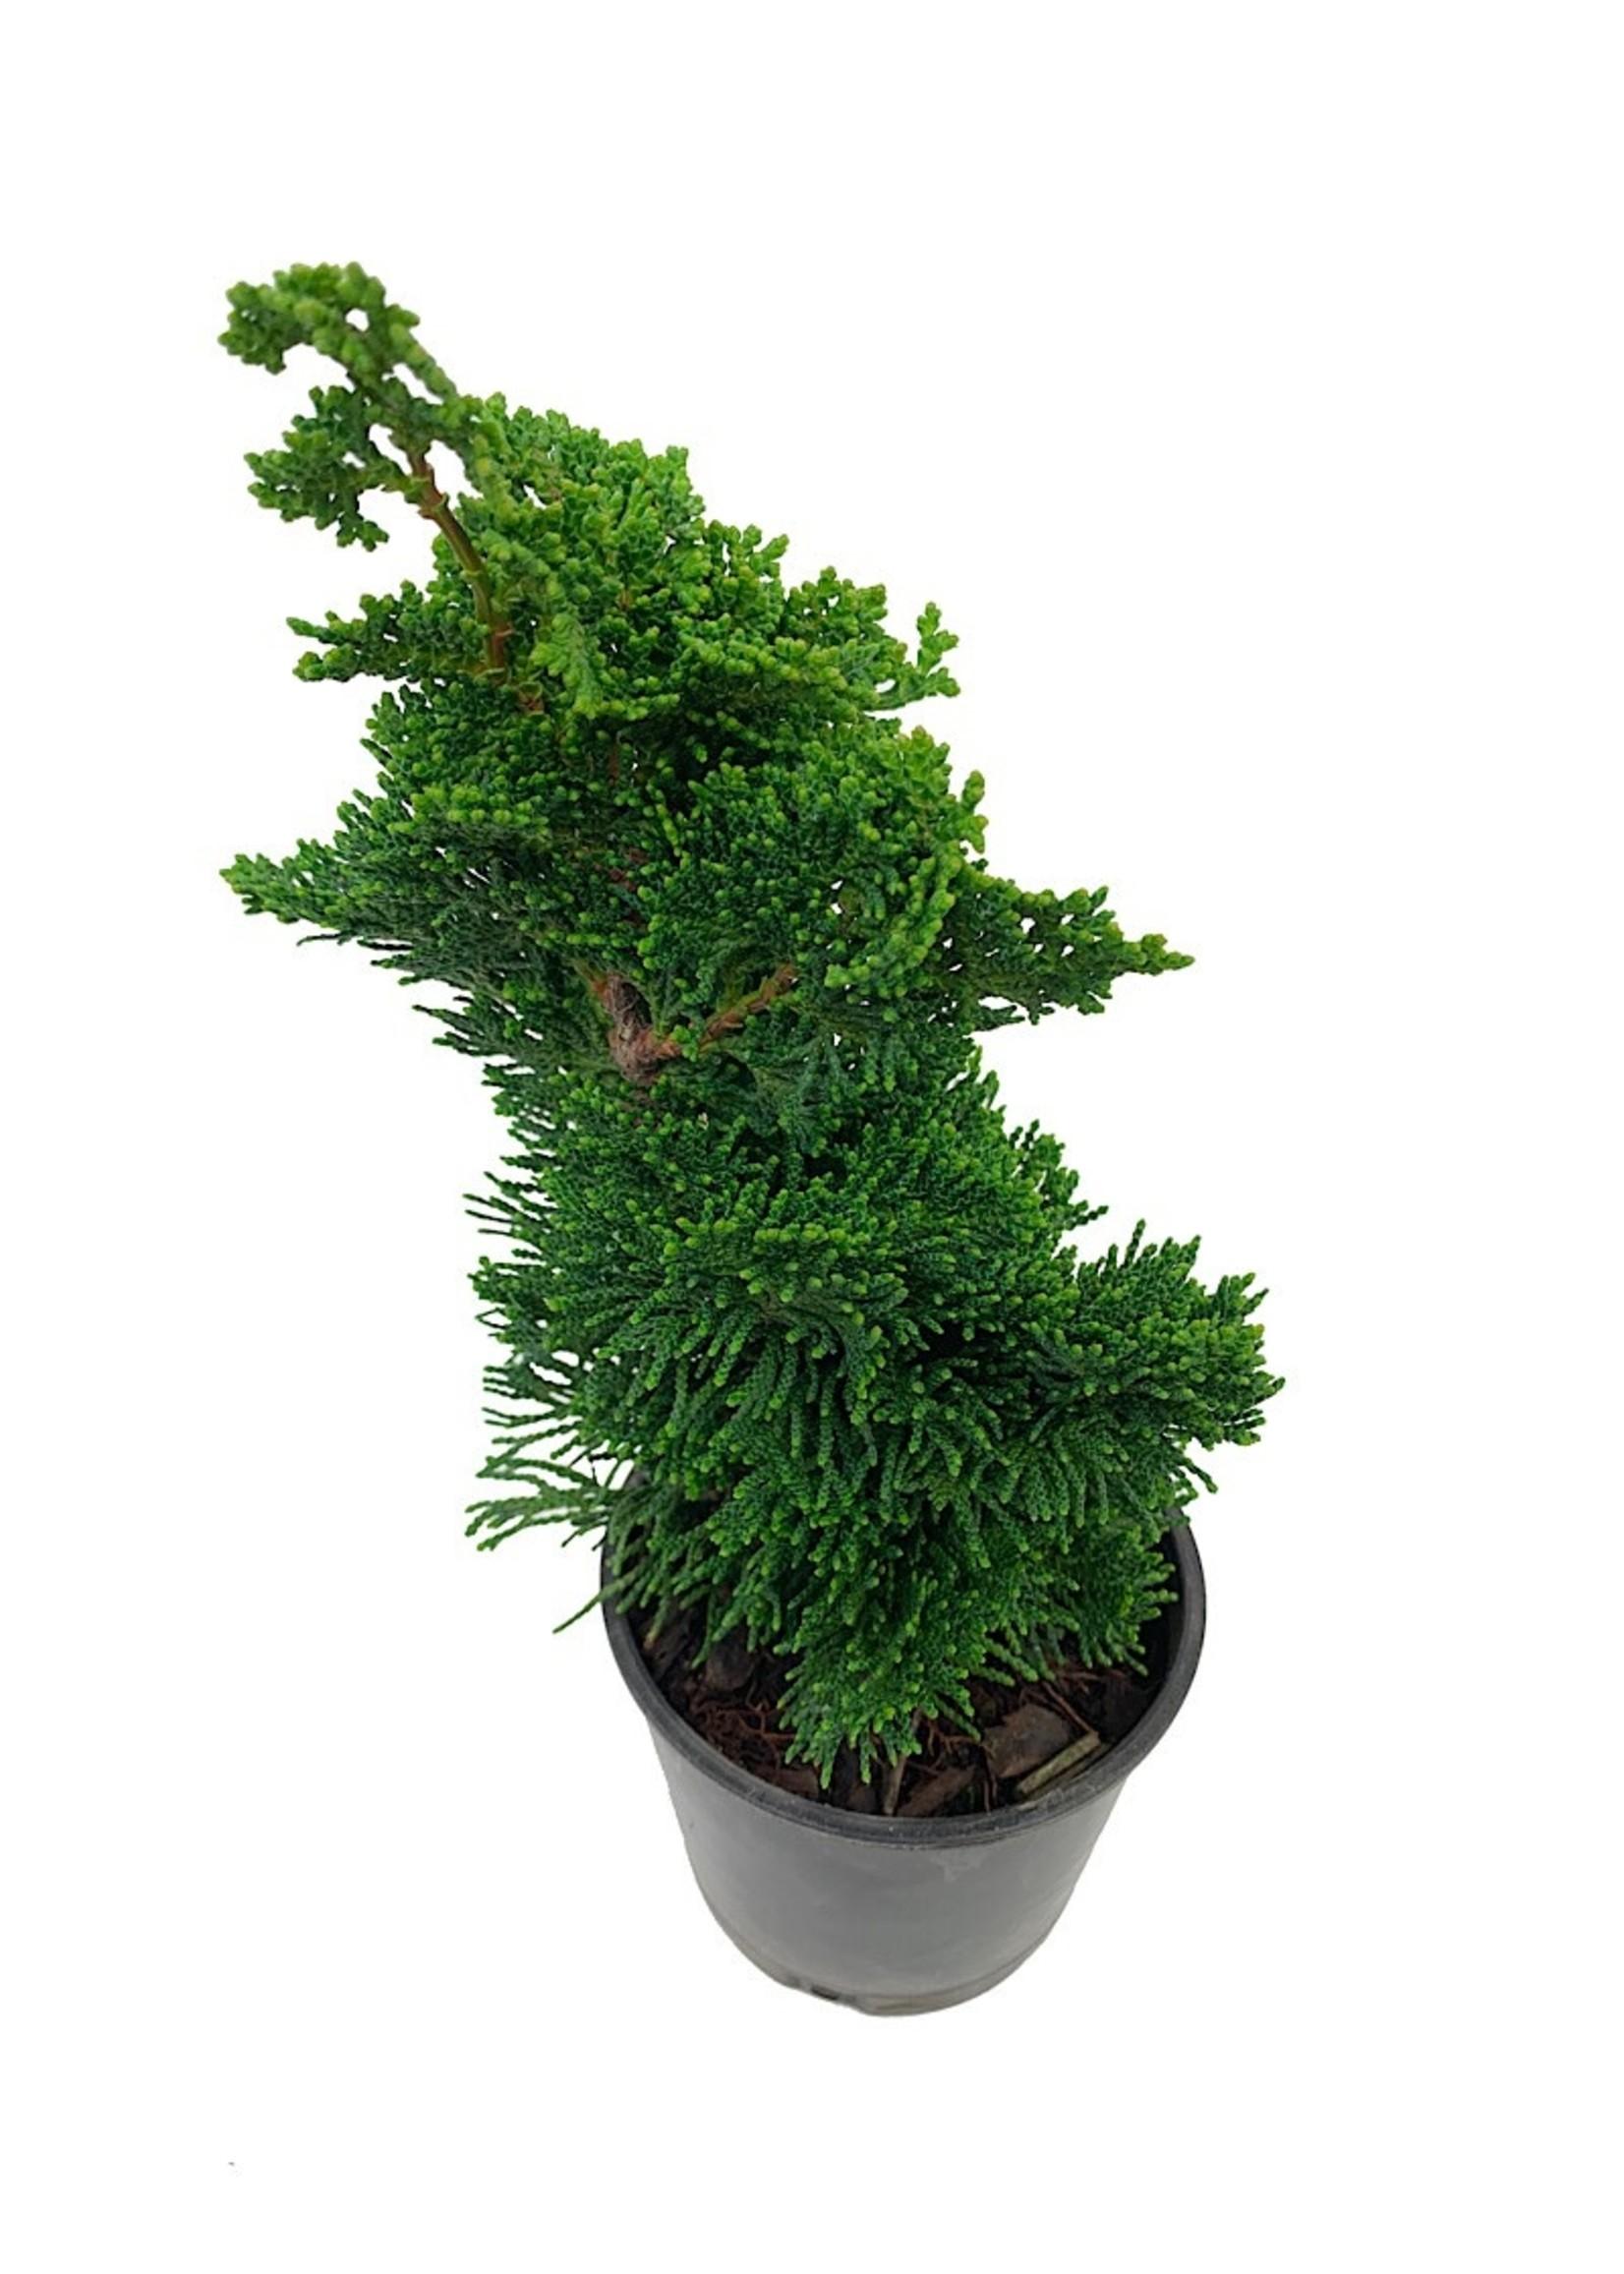 Chamaecyparis obtusa 'Thoweil' Bonsai 4 Inch